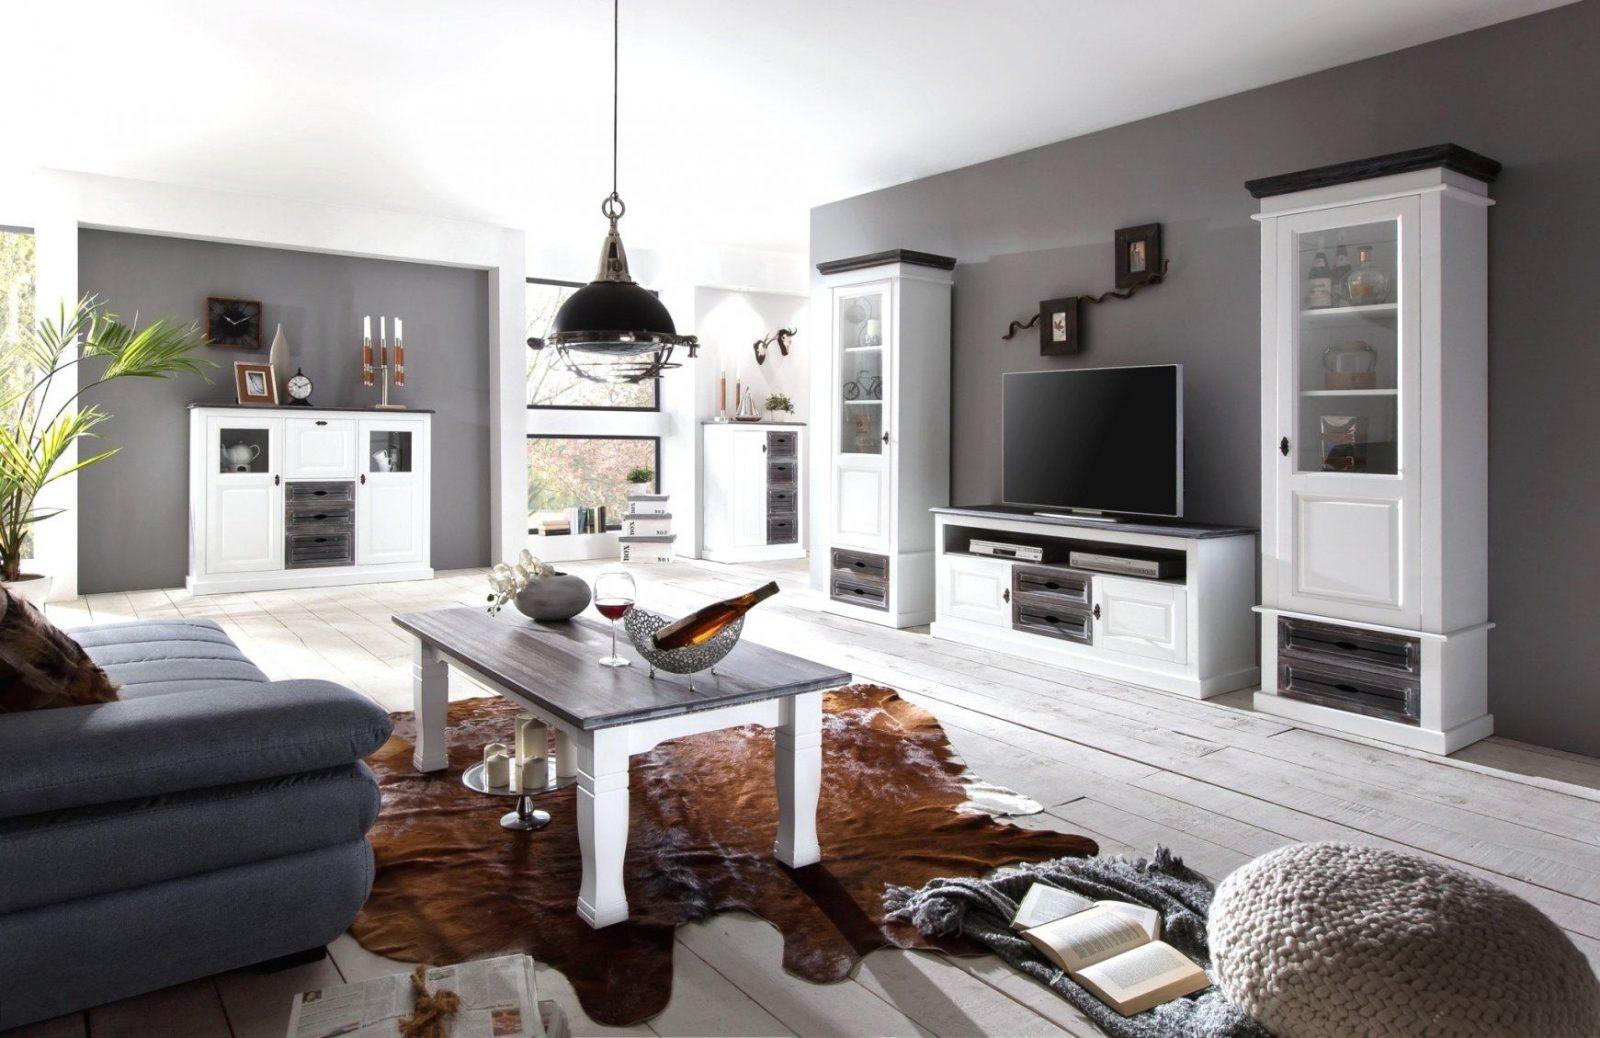 Bemerkenswerte Inspiration Welche Wandfarbe Zu Weißen Möbeln Und von Wandfarbe Zu Weißen Möbeln Bild